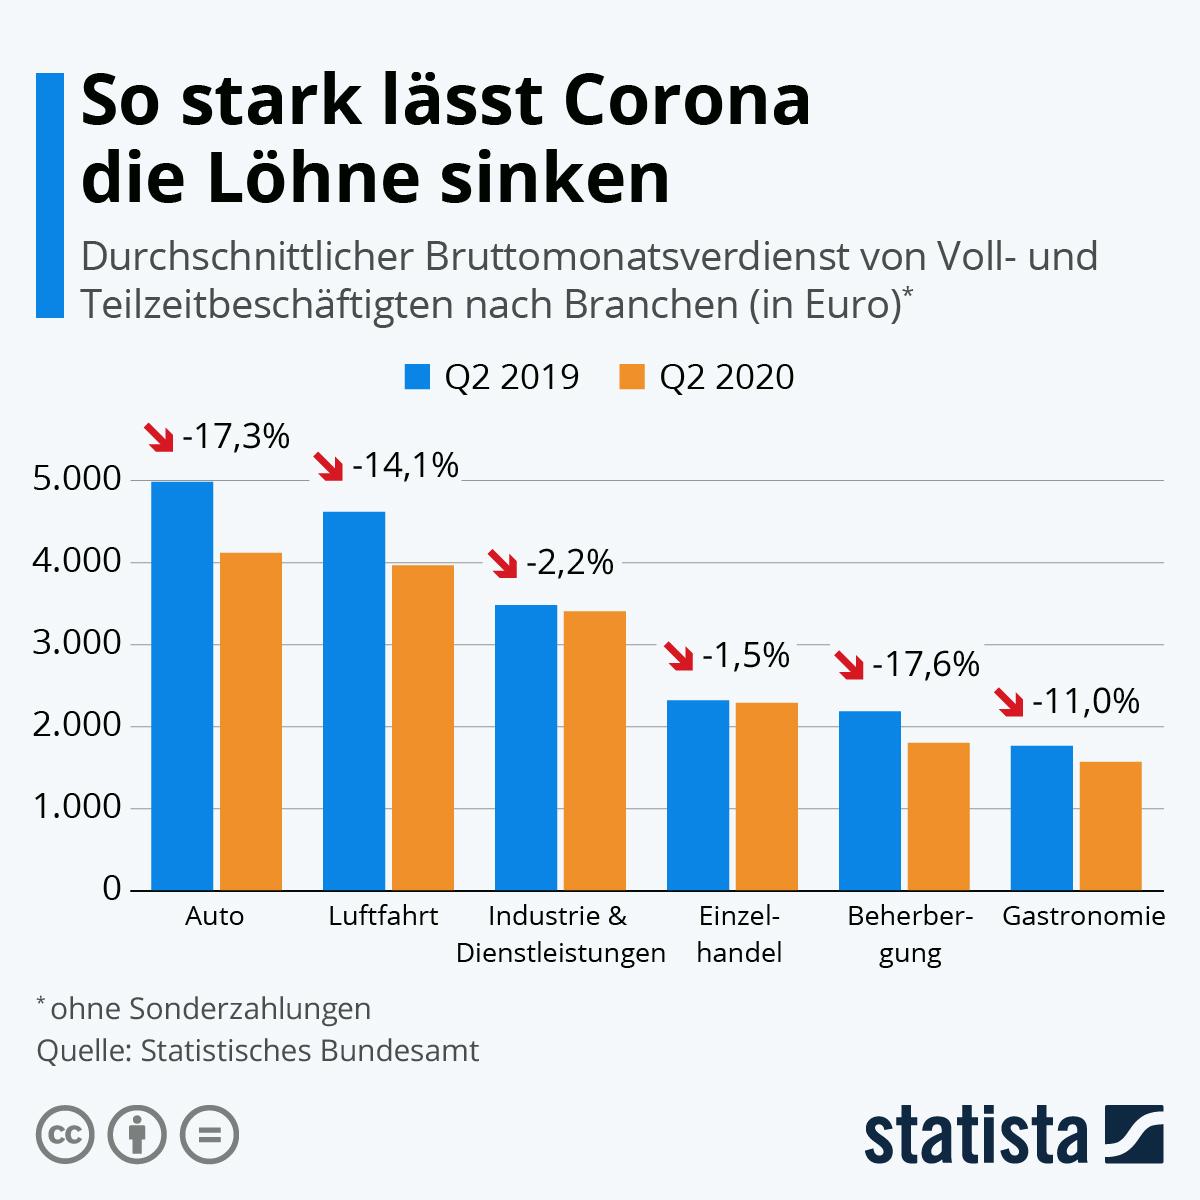 Infografik: So stark lässt Corona die Löhne sinken | Statista